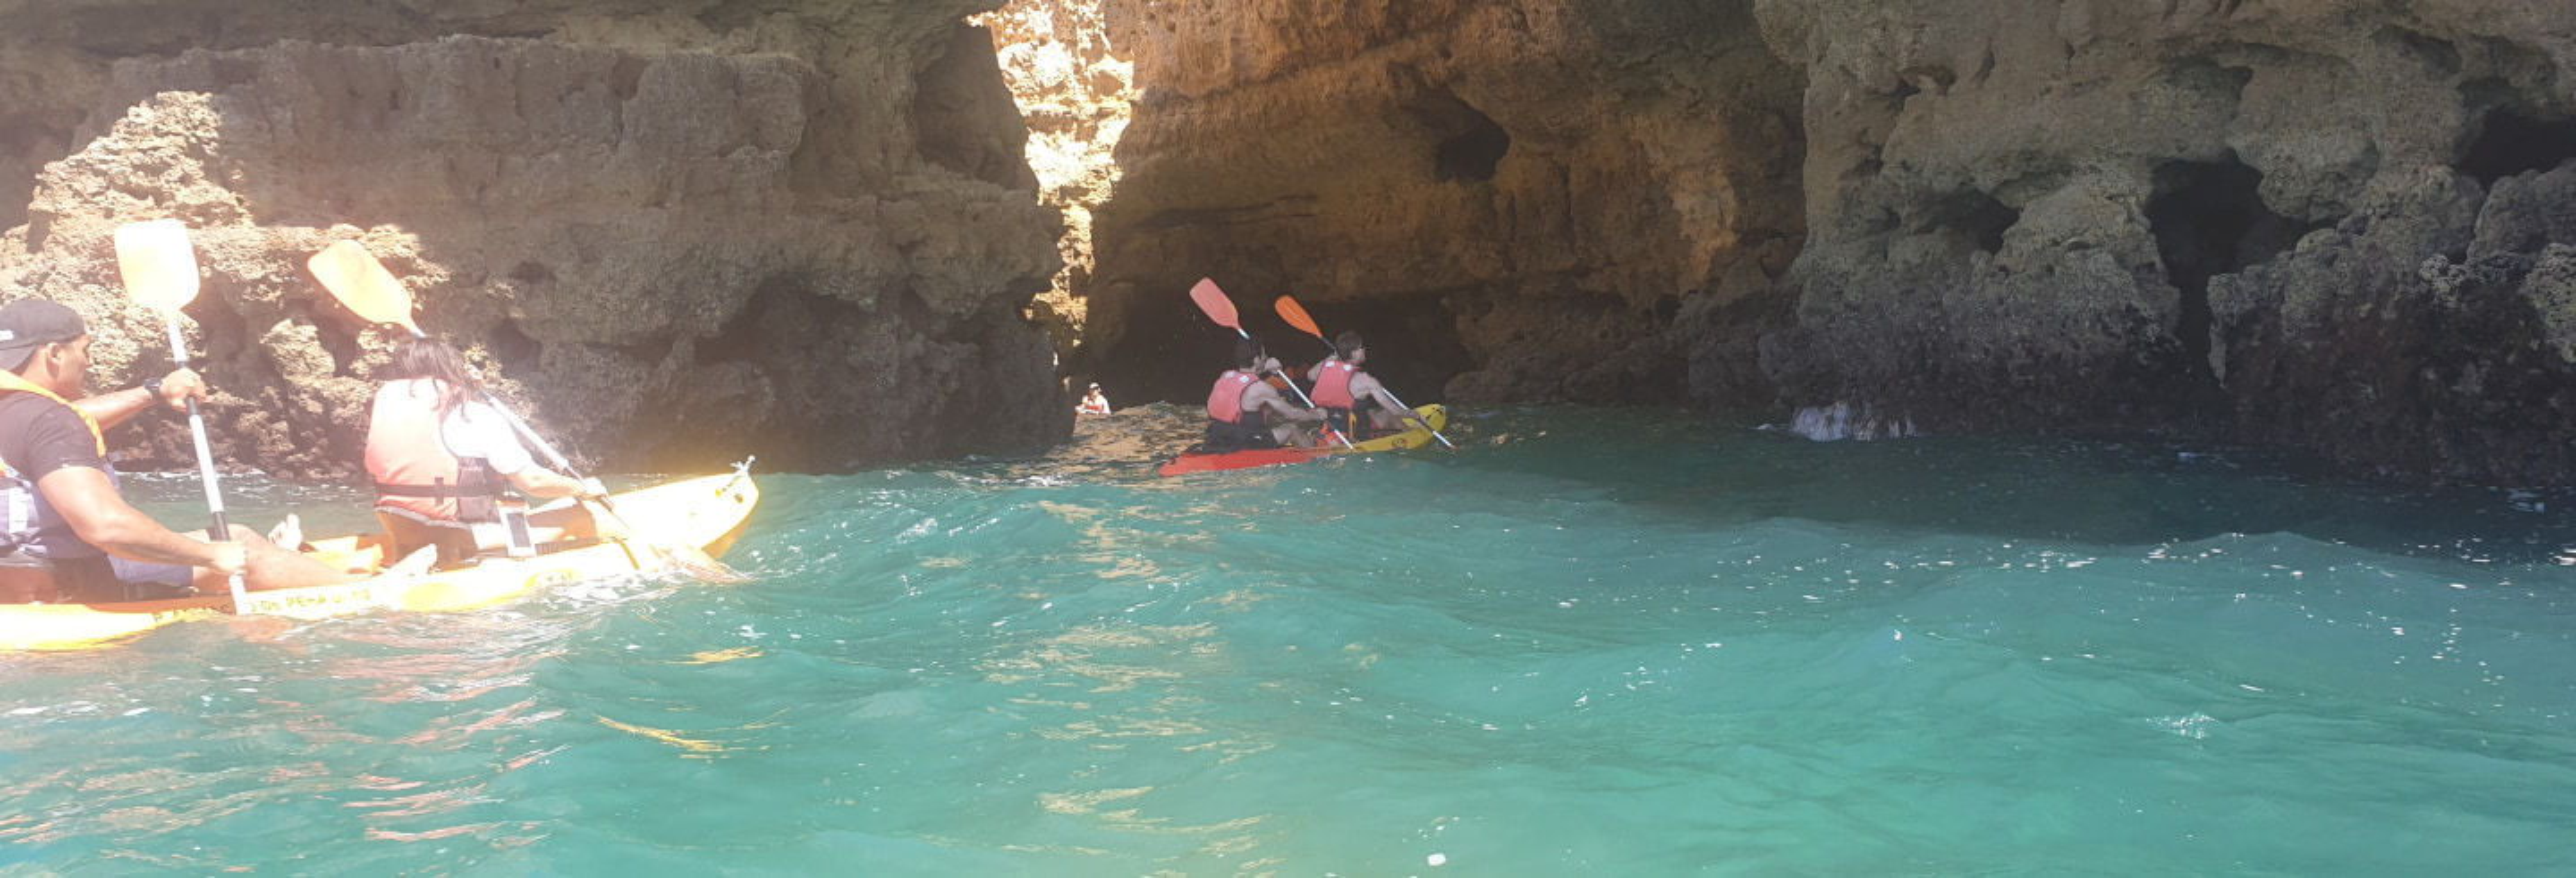 Tour en kayak por las cuevas de Armação de Pêra